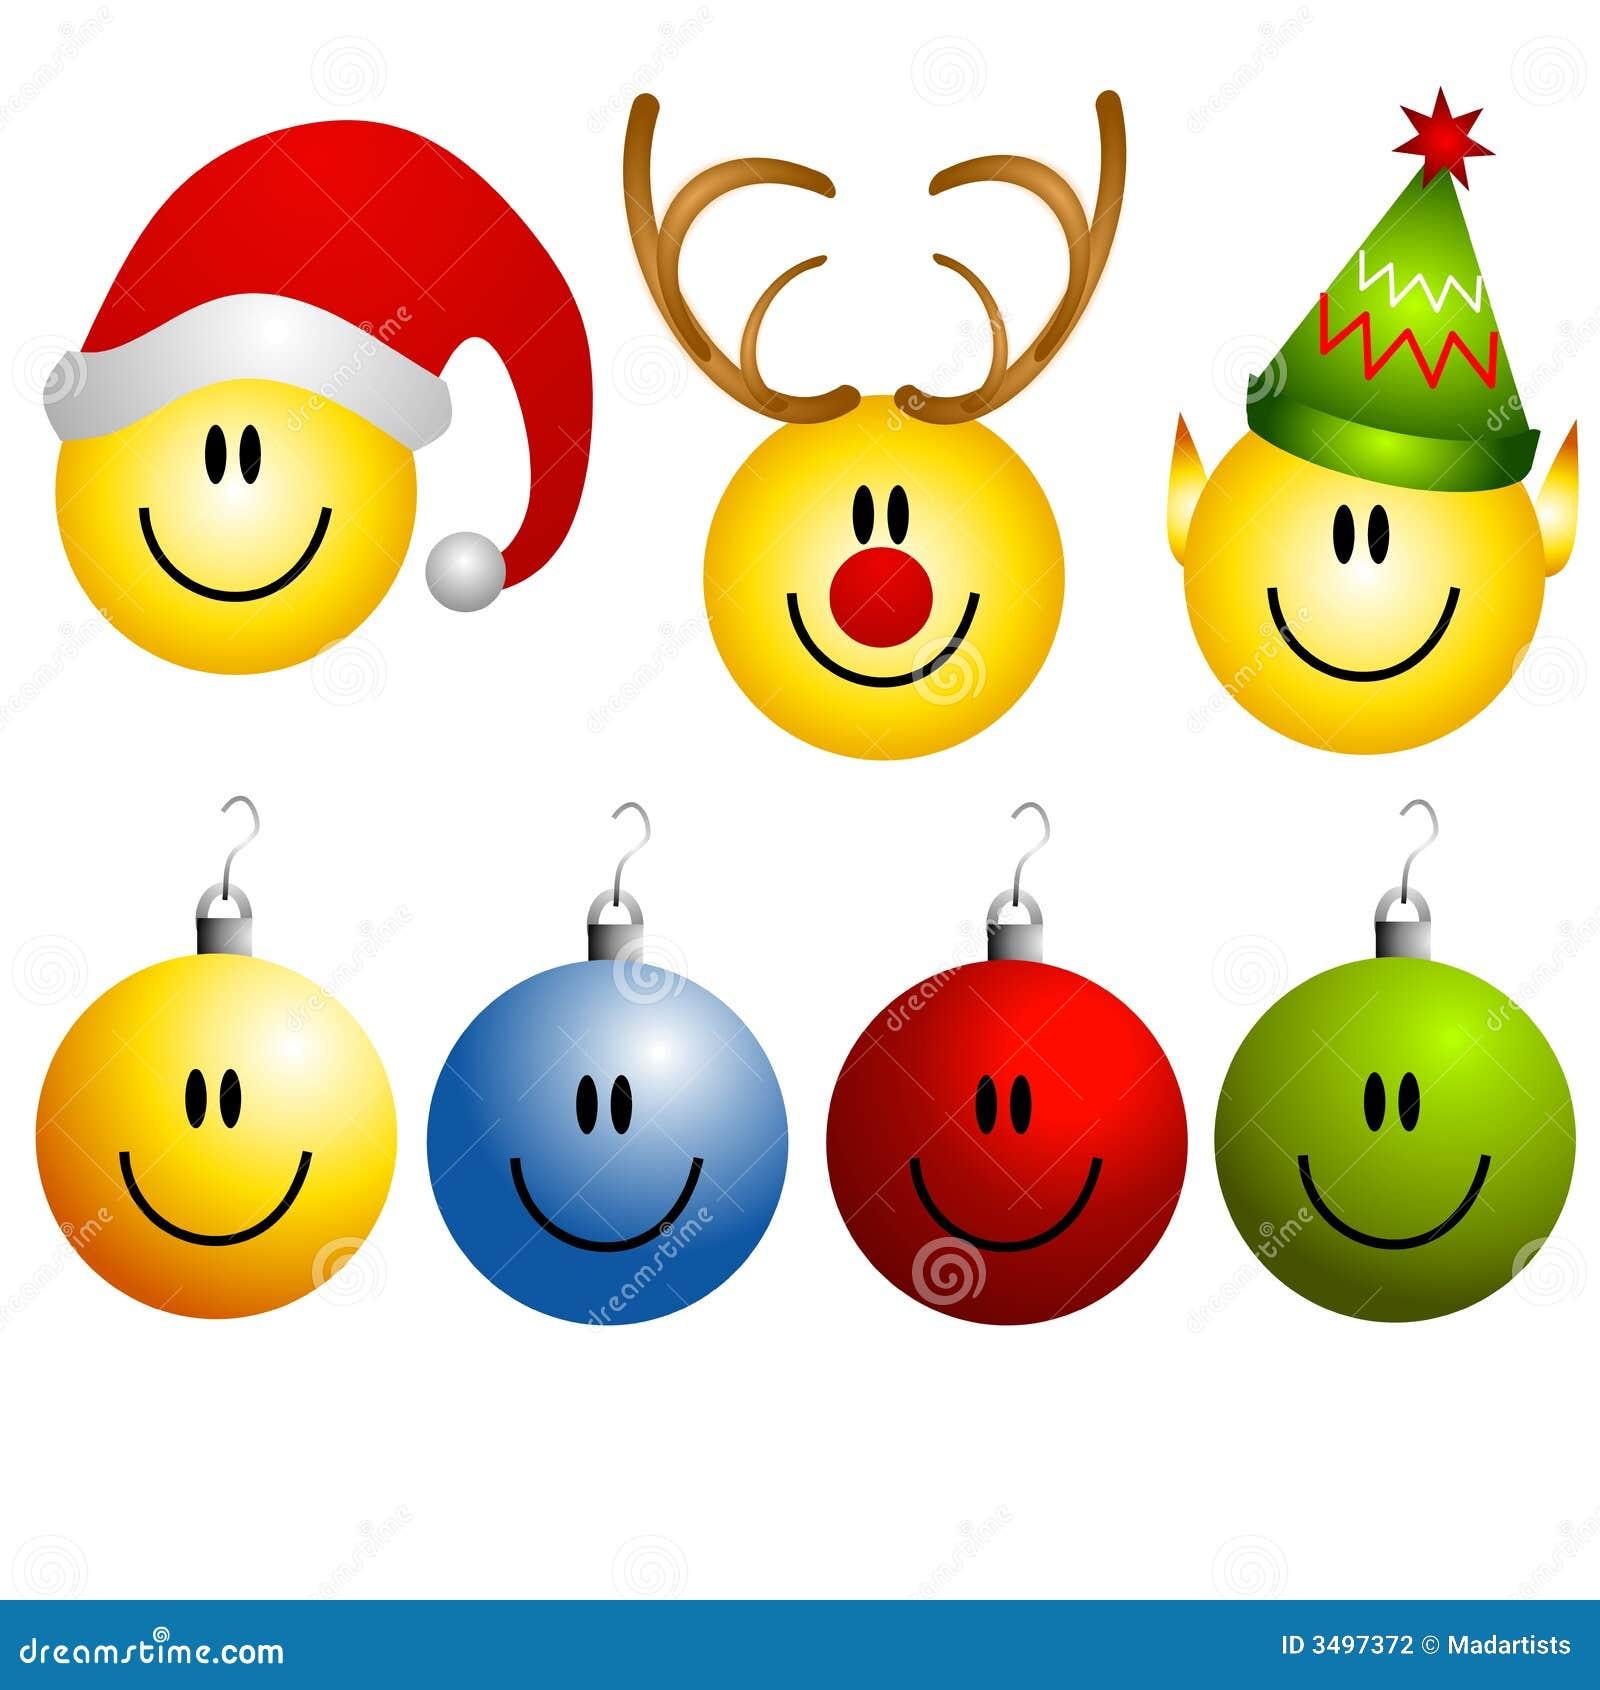 Xmas Smileys Ornament Icons Stock Photography Image 3497372